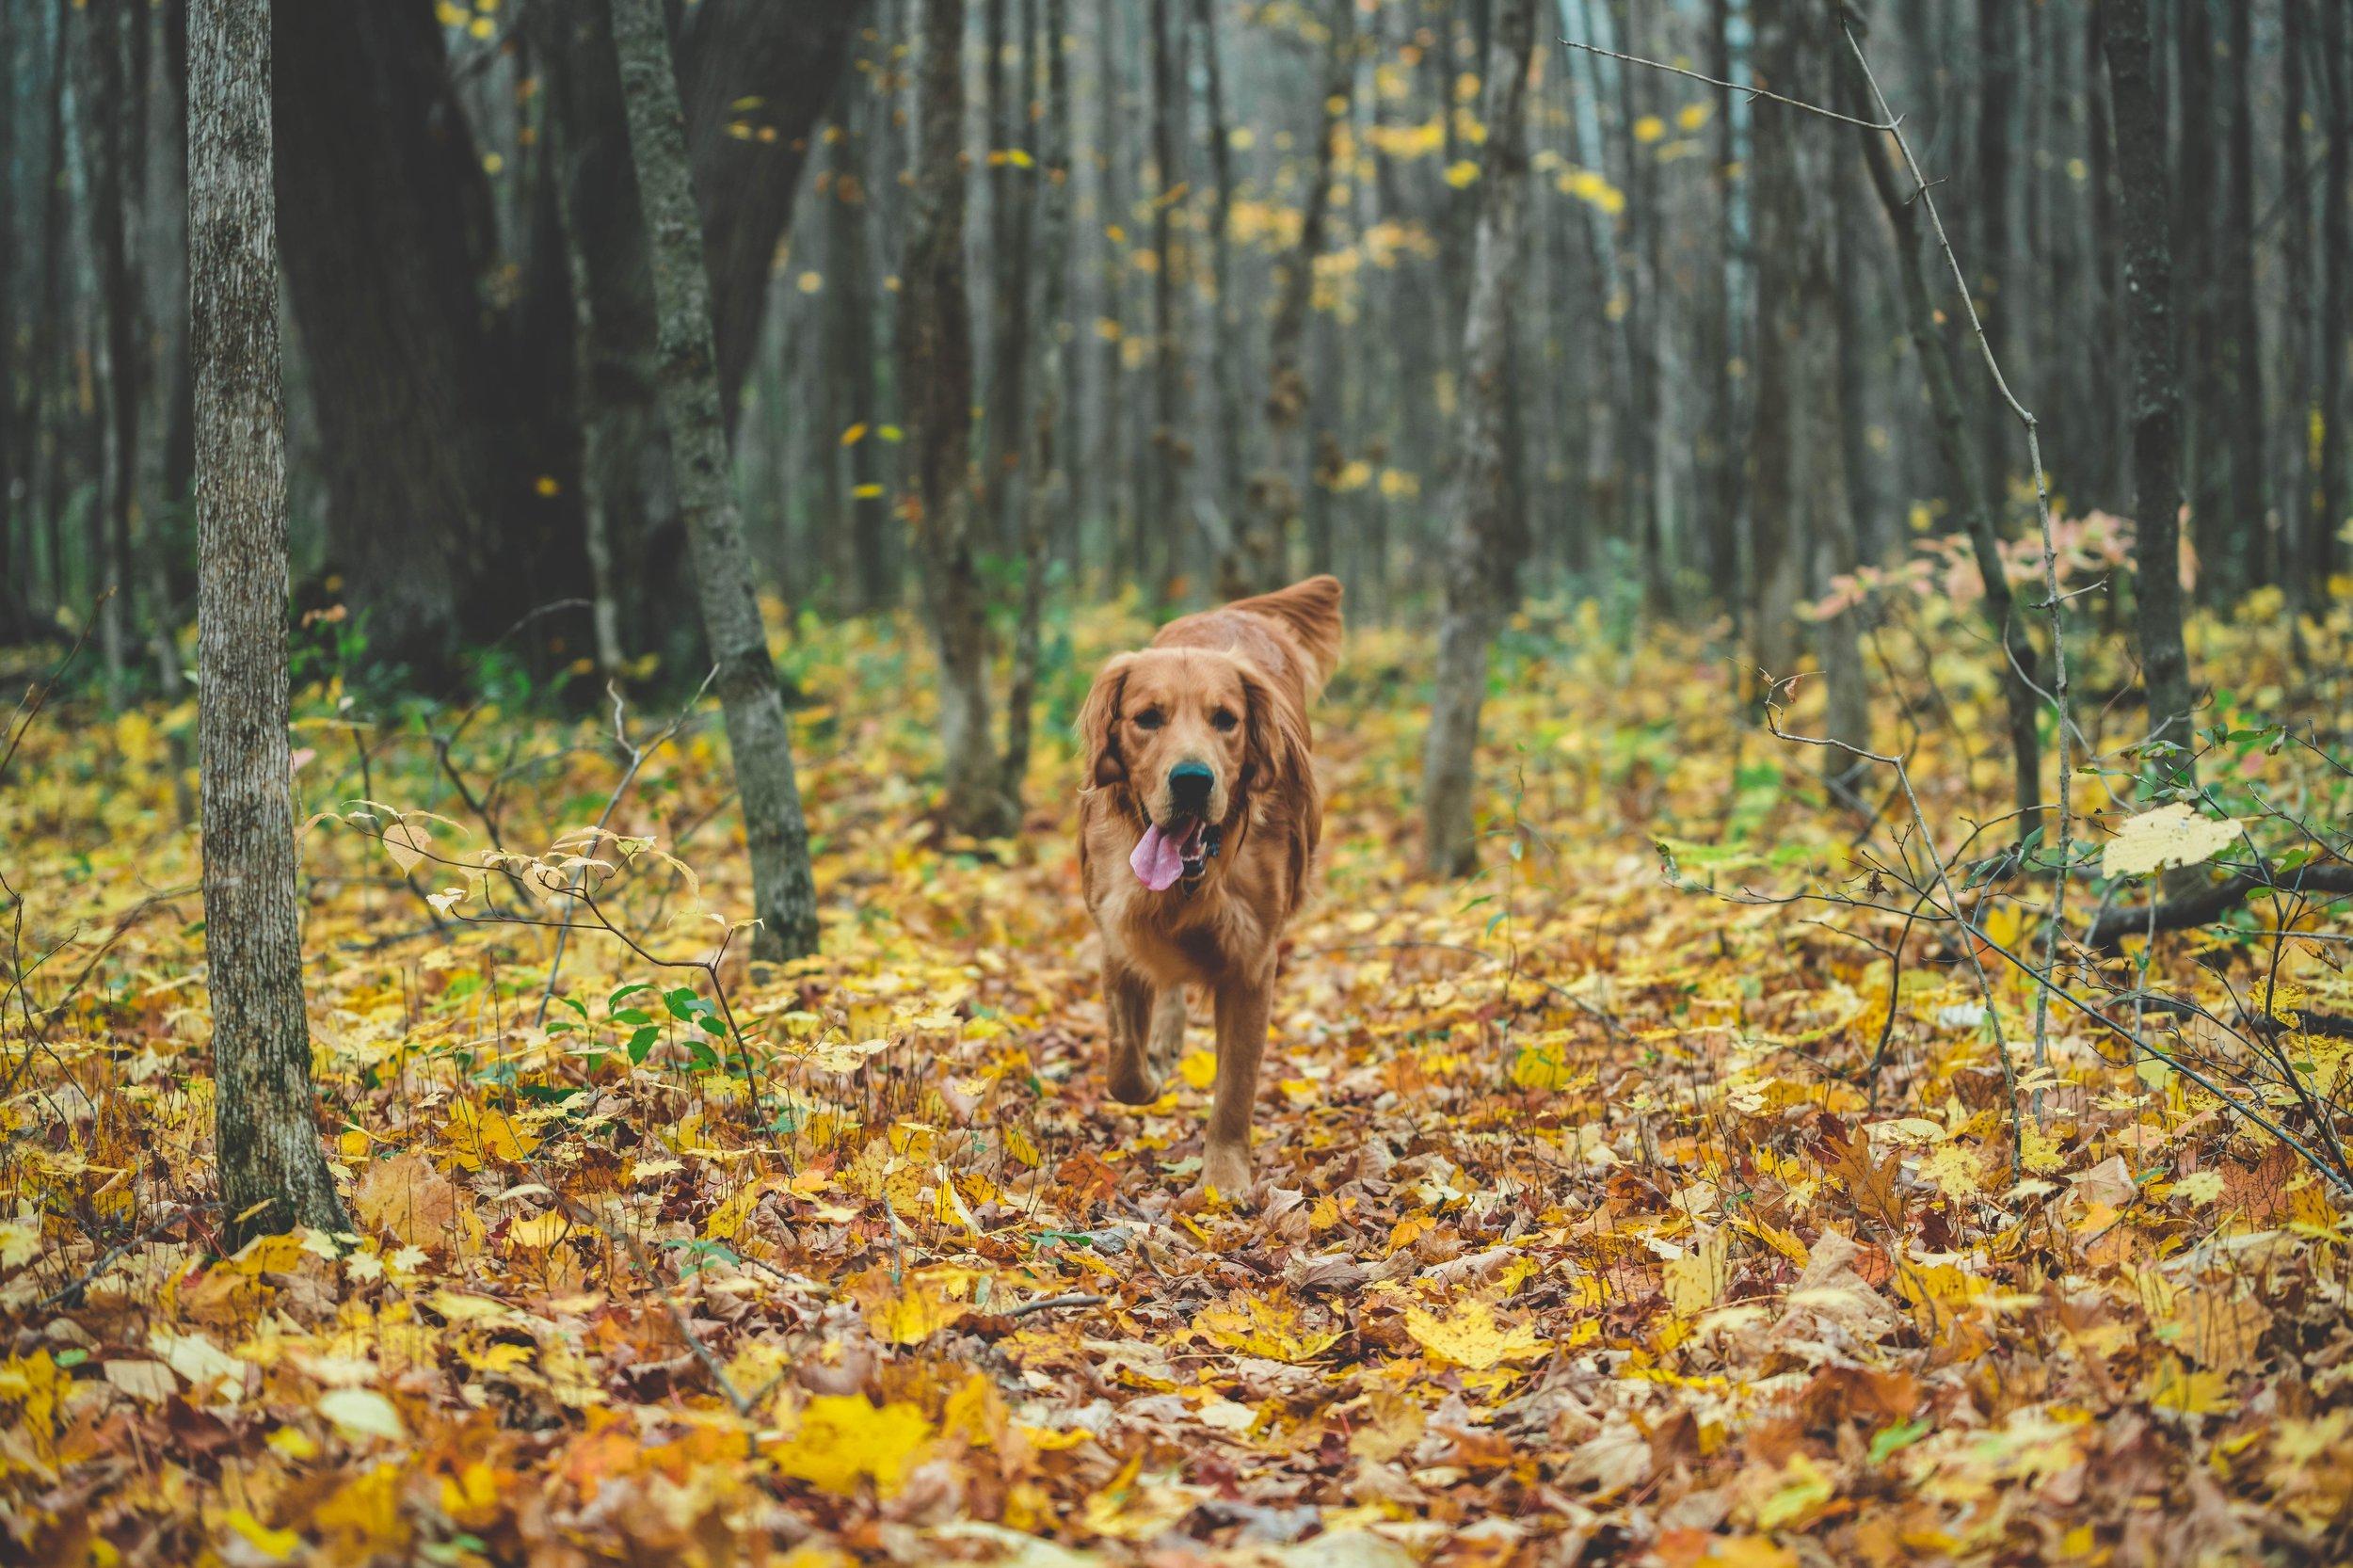 dog-running-in-fall-leaves_4460x4460.jpg